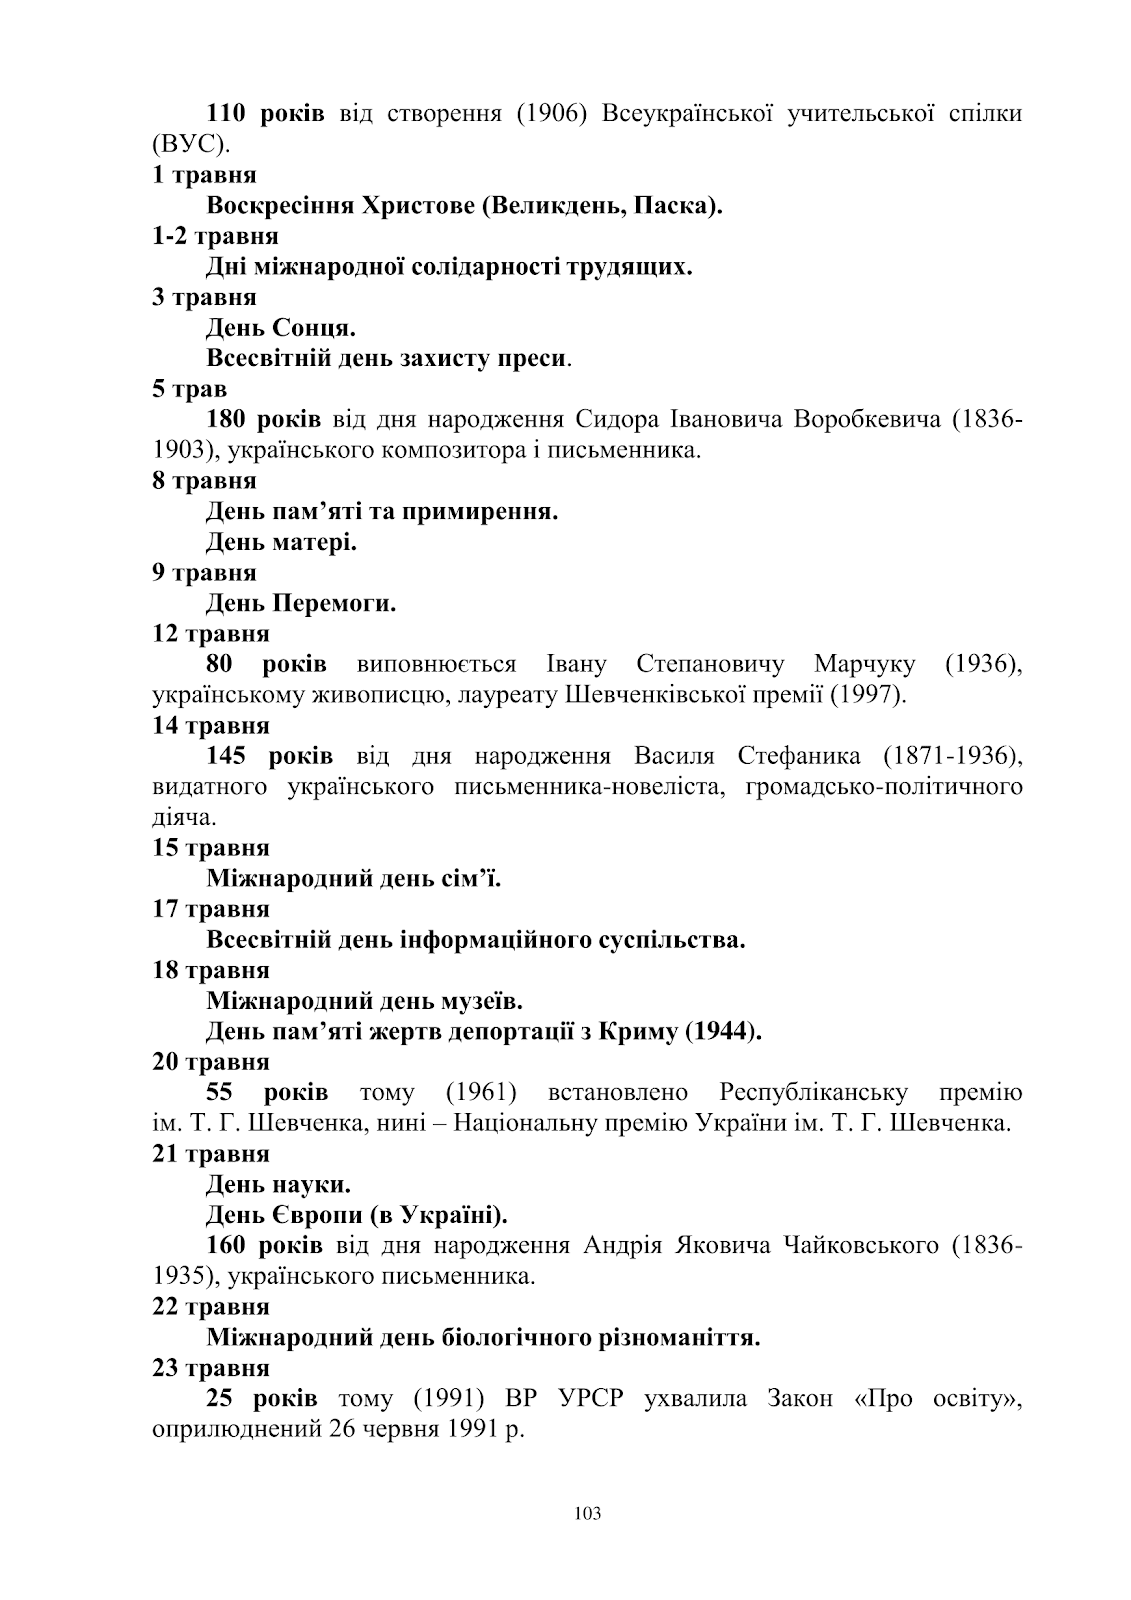 C:\Users\Валерия\Desktop\план 2016 рік\план 2016 рік-103.png